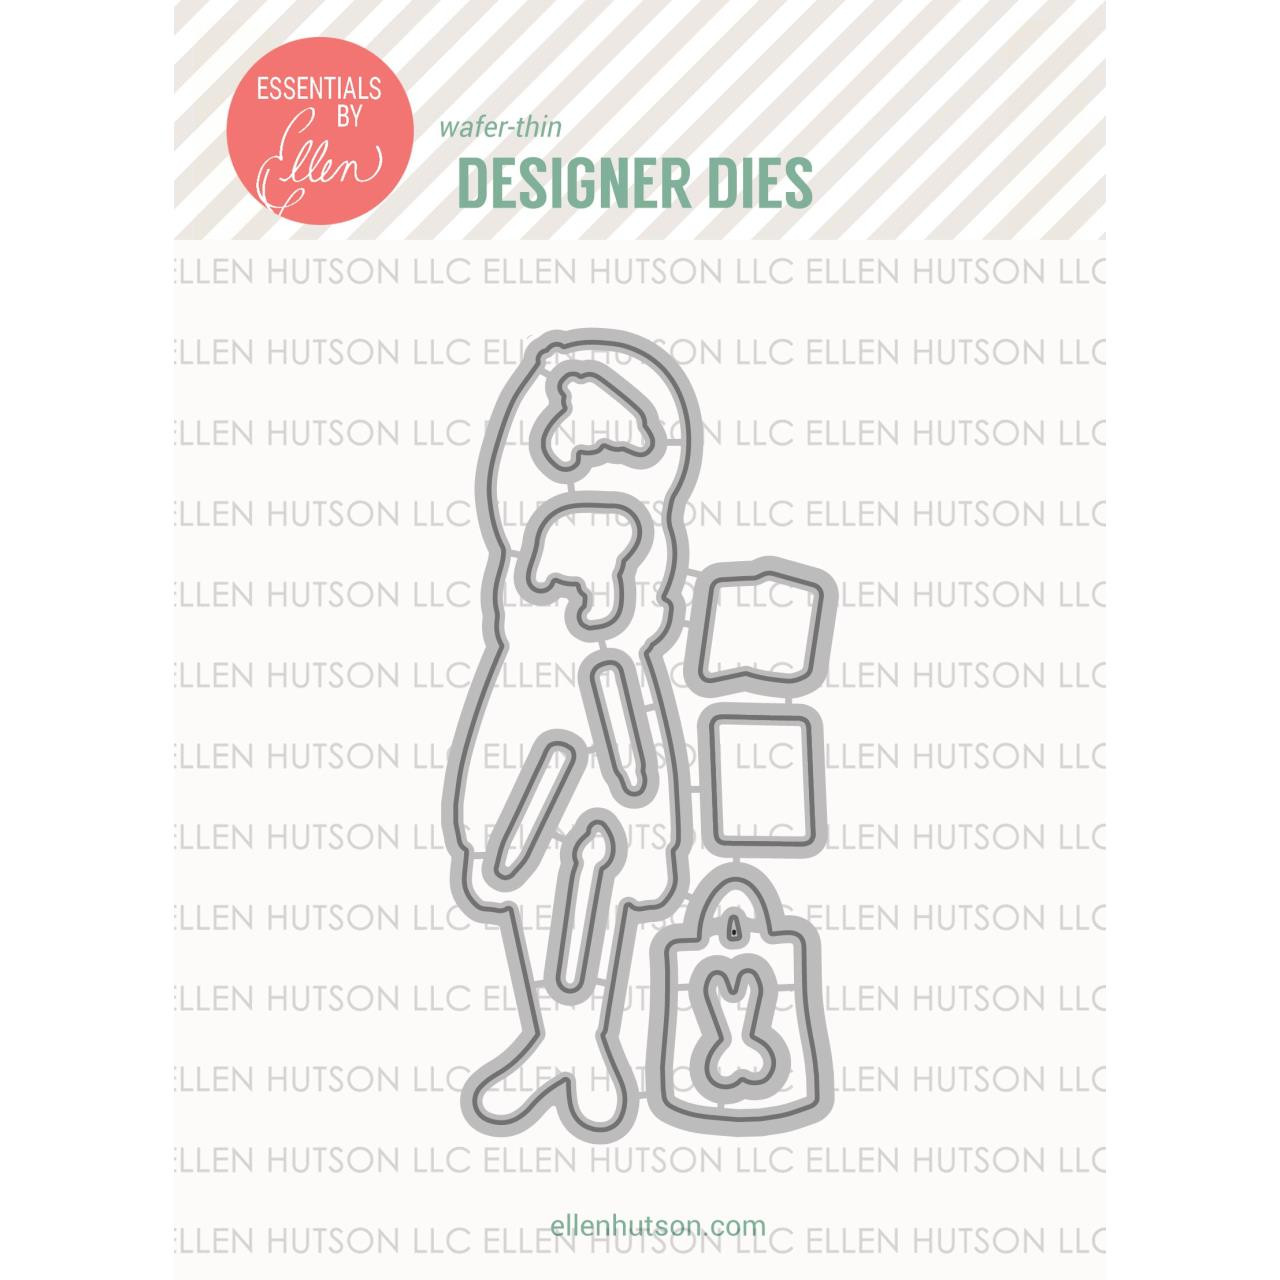 Essentials by Ellen Designer Dies, Leading Ladies - Crafty Lady by Brandi Kincaid -